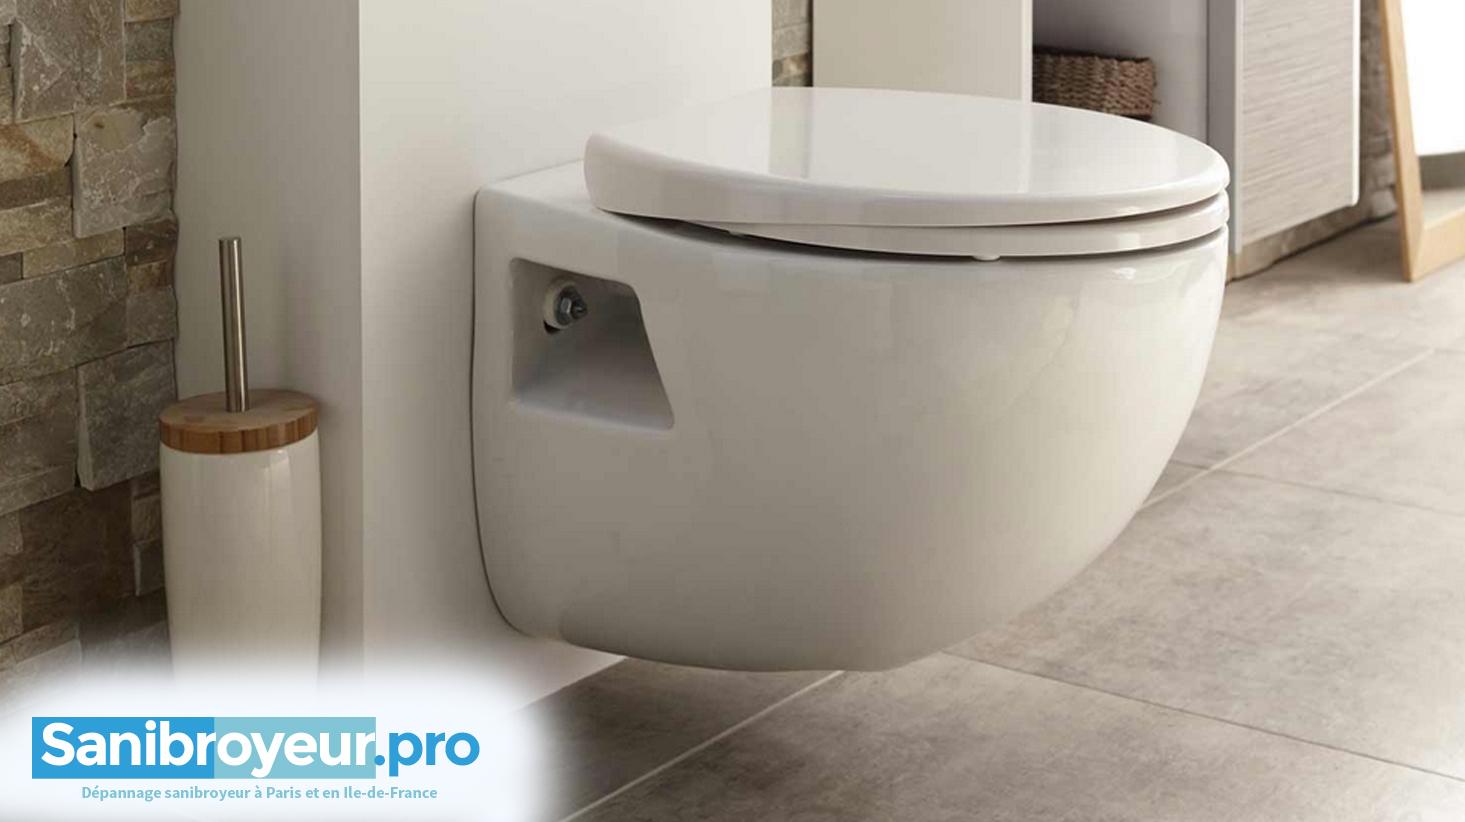 pose sanibroyeur fabulous rnovation duune salle de bain grenoble with pose sanibroyeur les. Black Bedroom Furniture Sets. Home Design Ideas